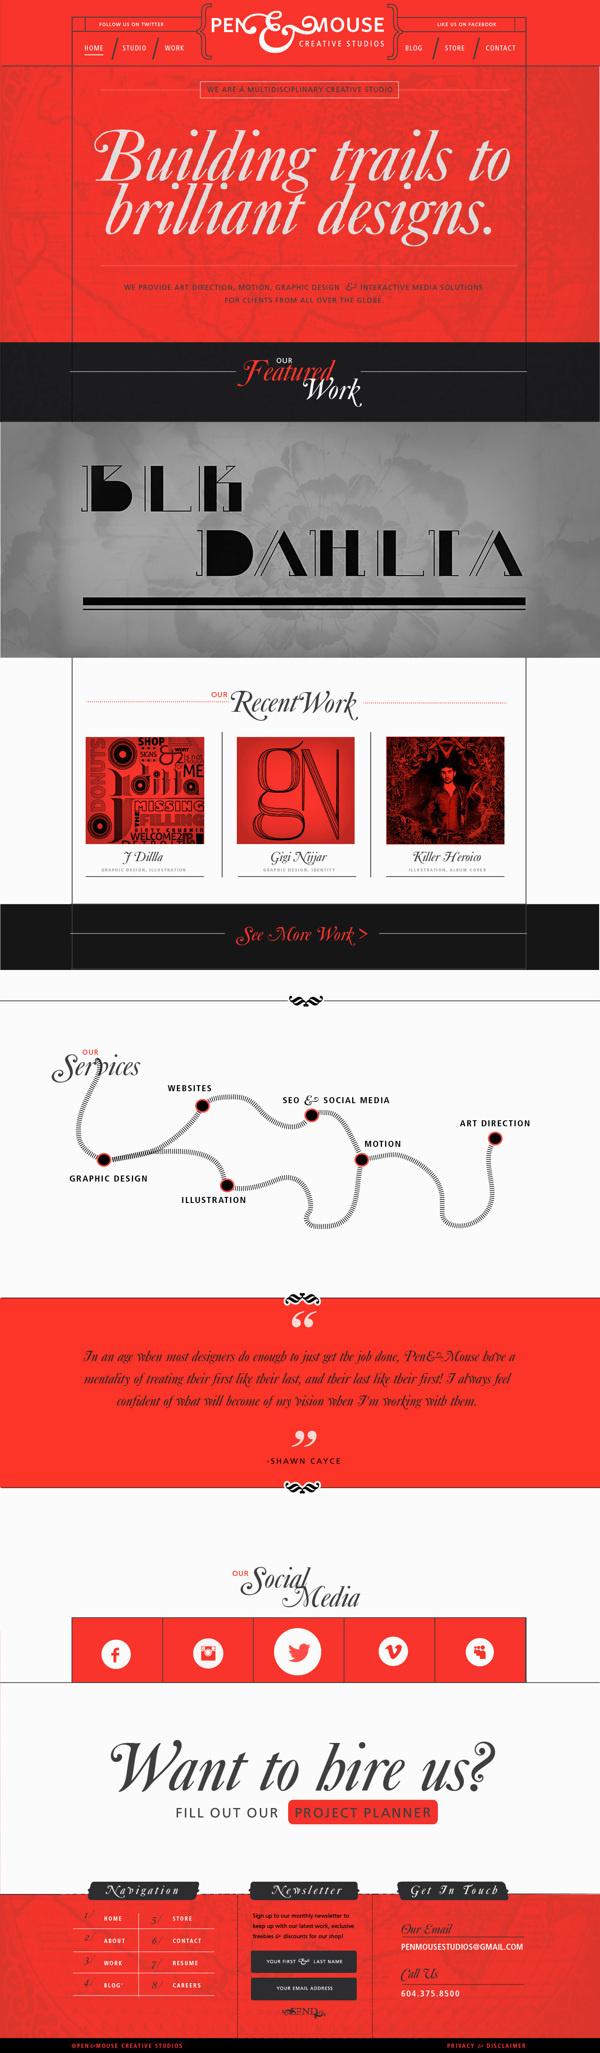 Pen&Mouse - Personal Branding #creative #design #unique #website #layout #web #typography